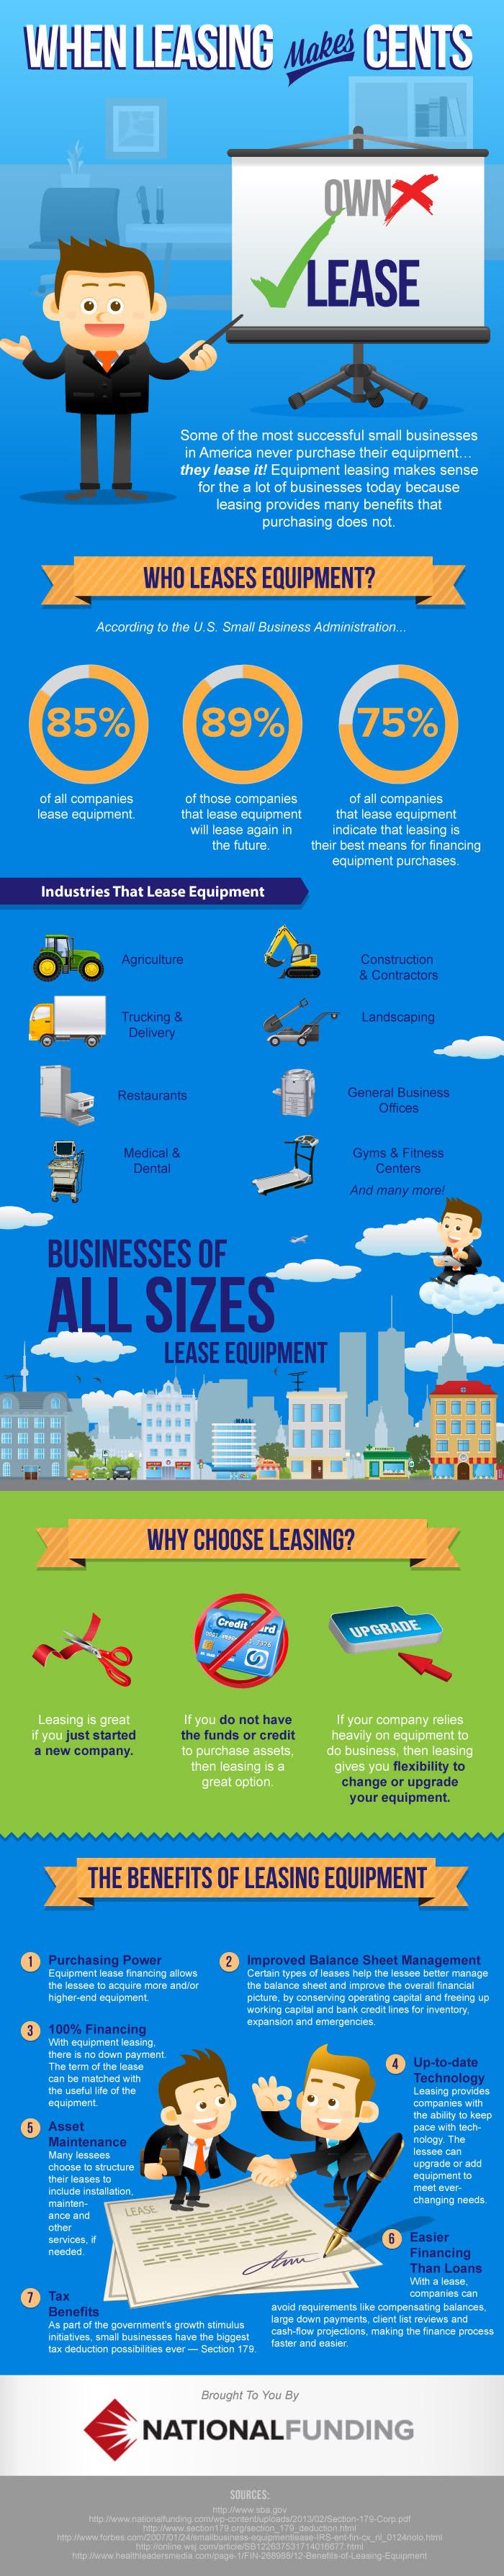 When leasing business equipment makes sense